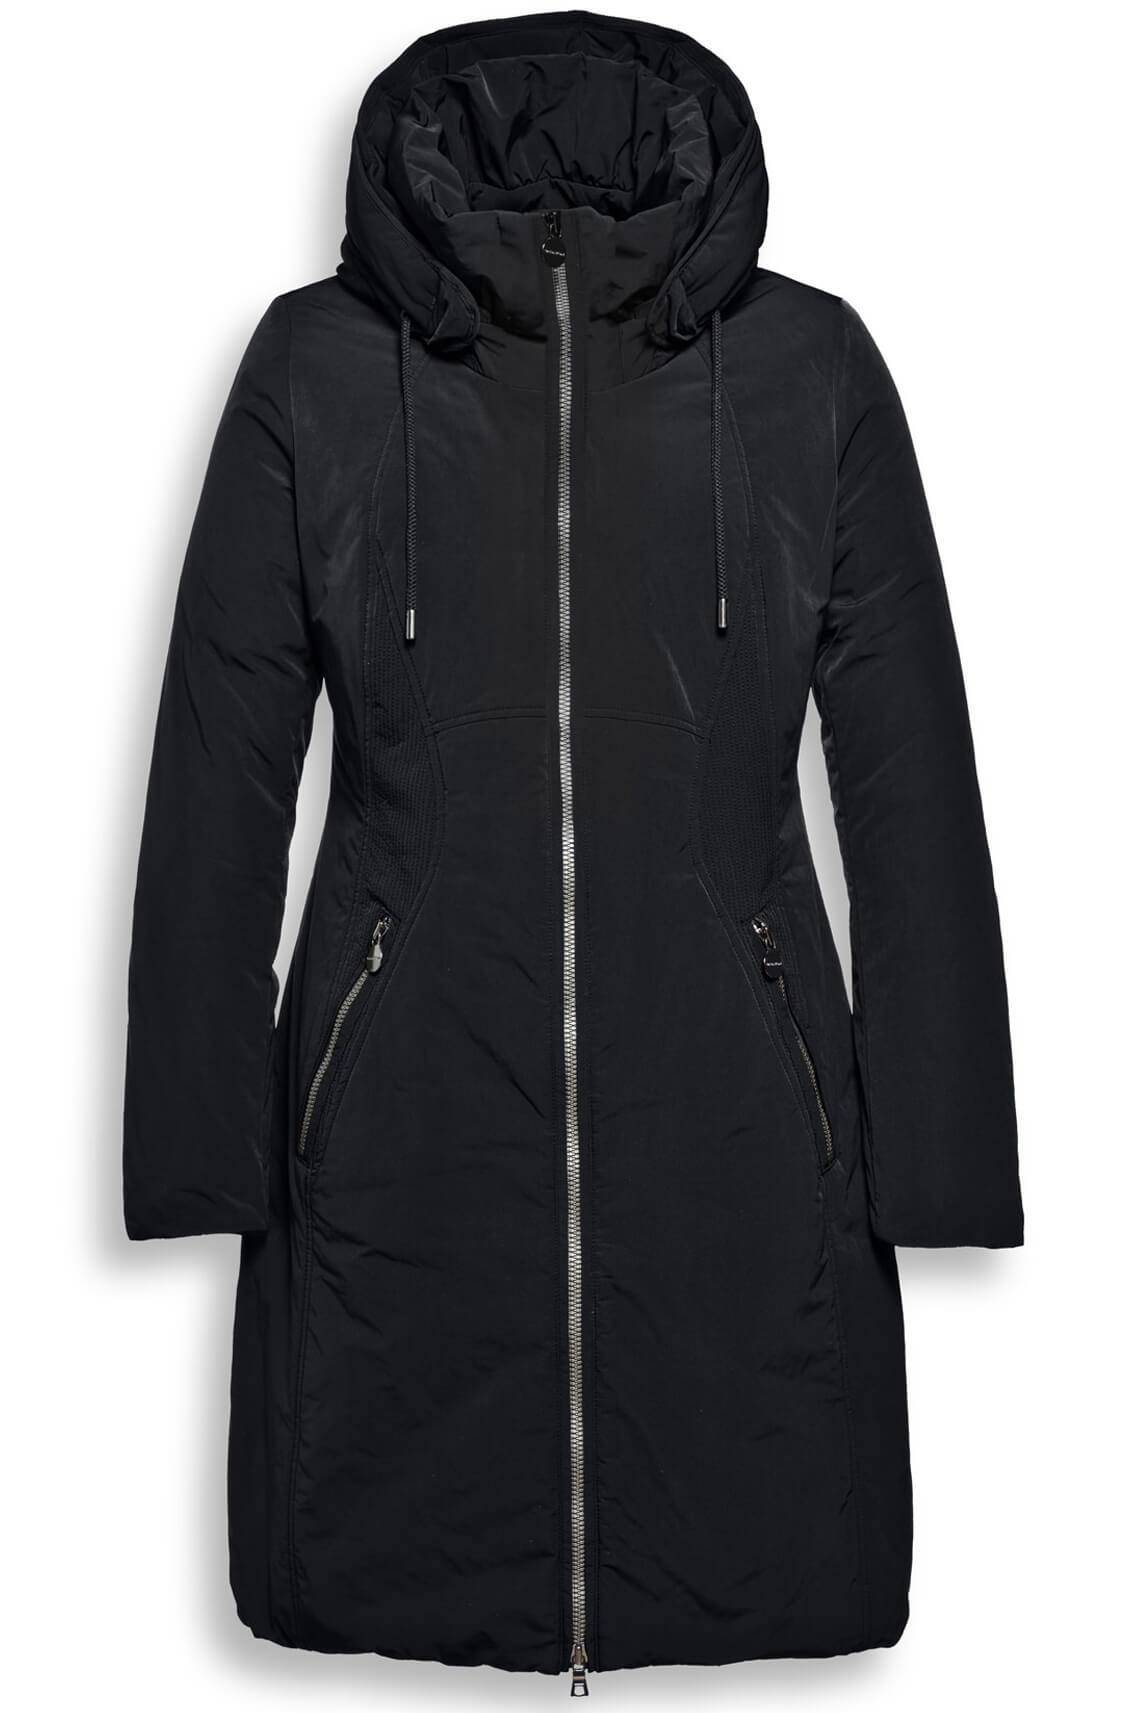 Creenstone Dames Lange casual jas zwart zwart